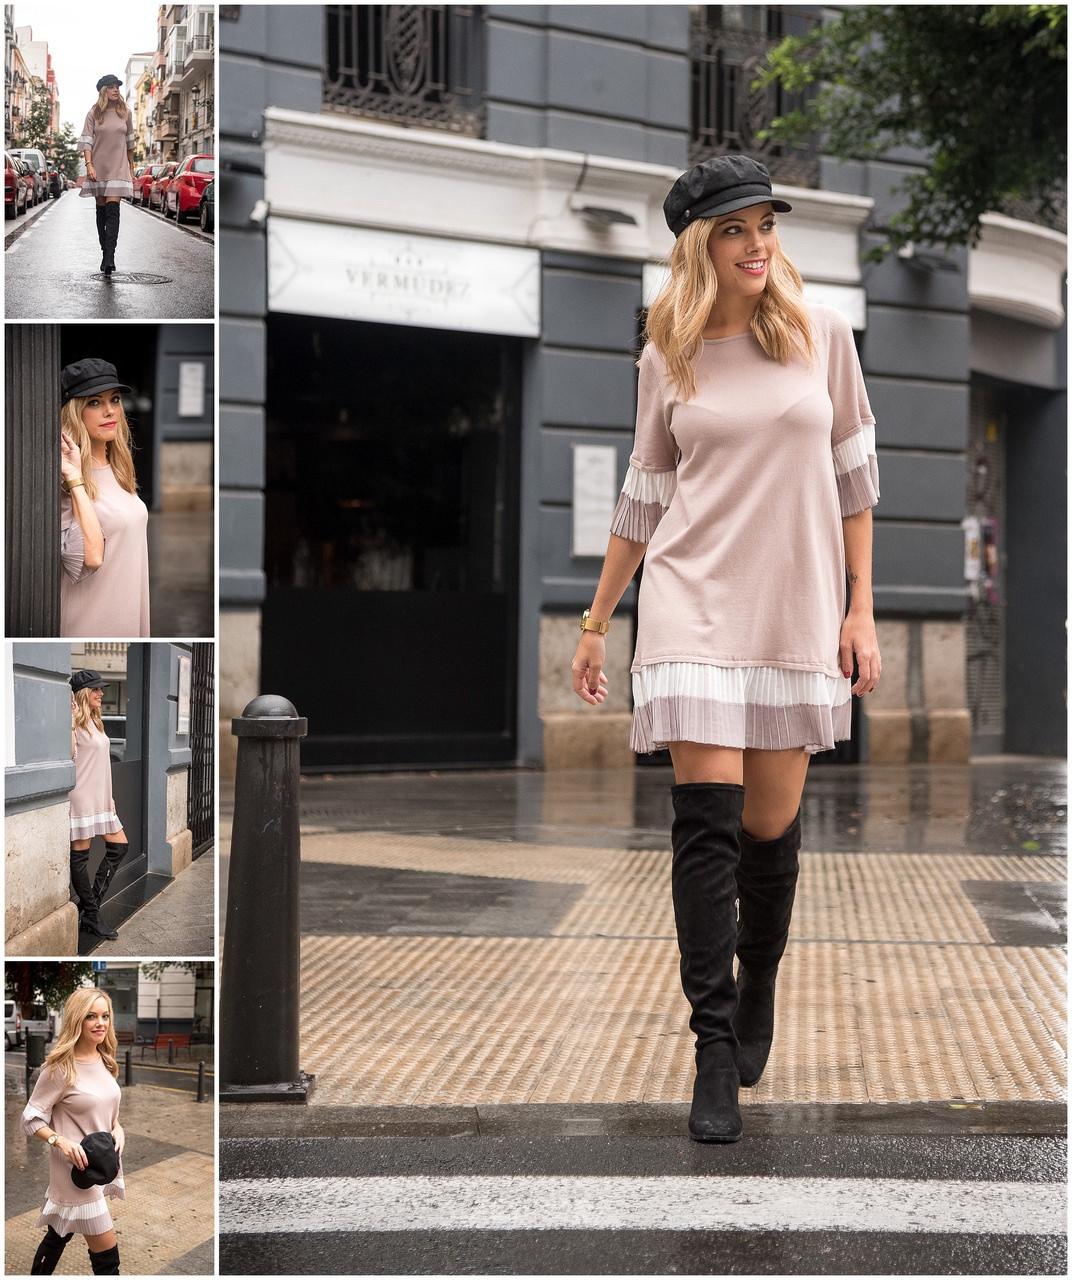 fotografo moda valencia-ruzafa3